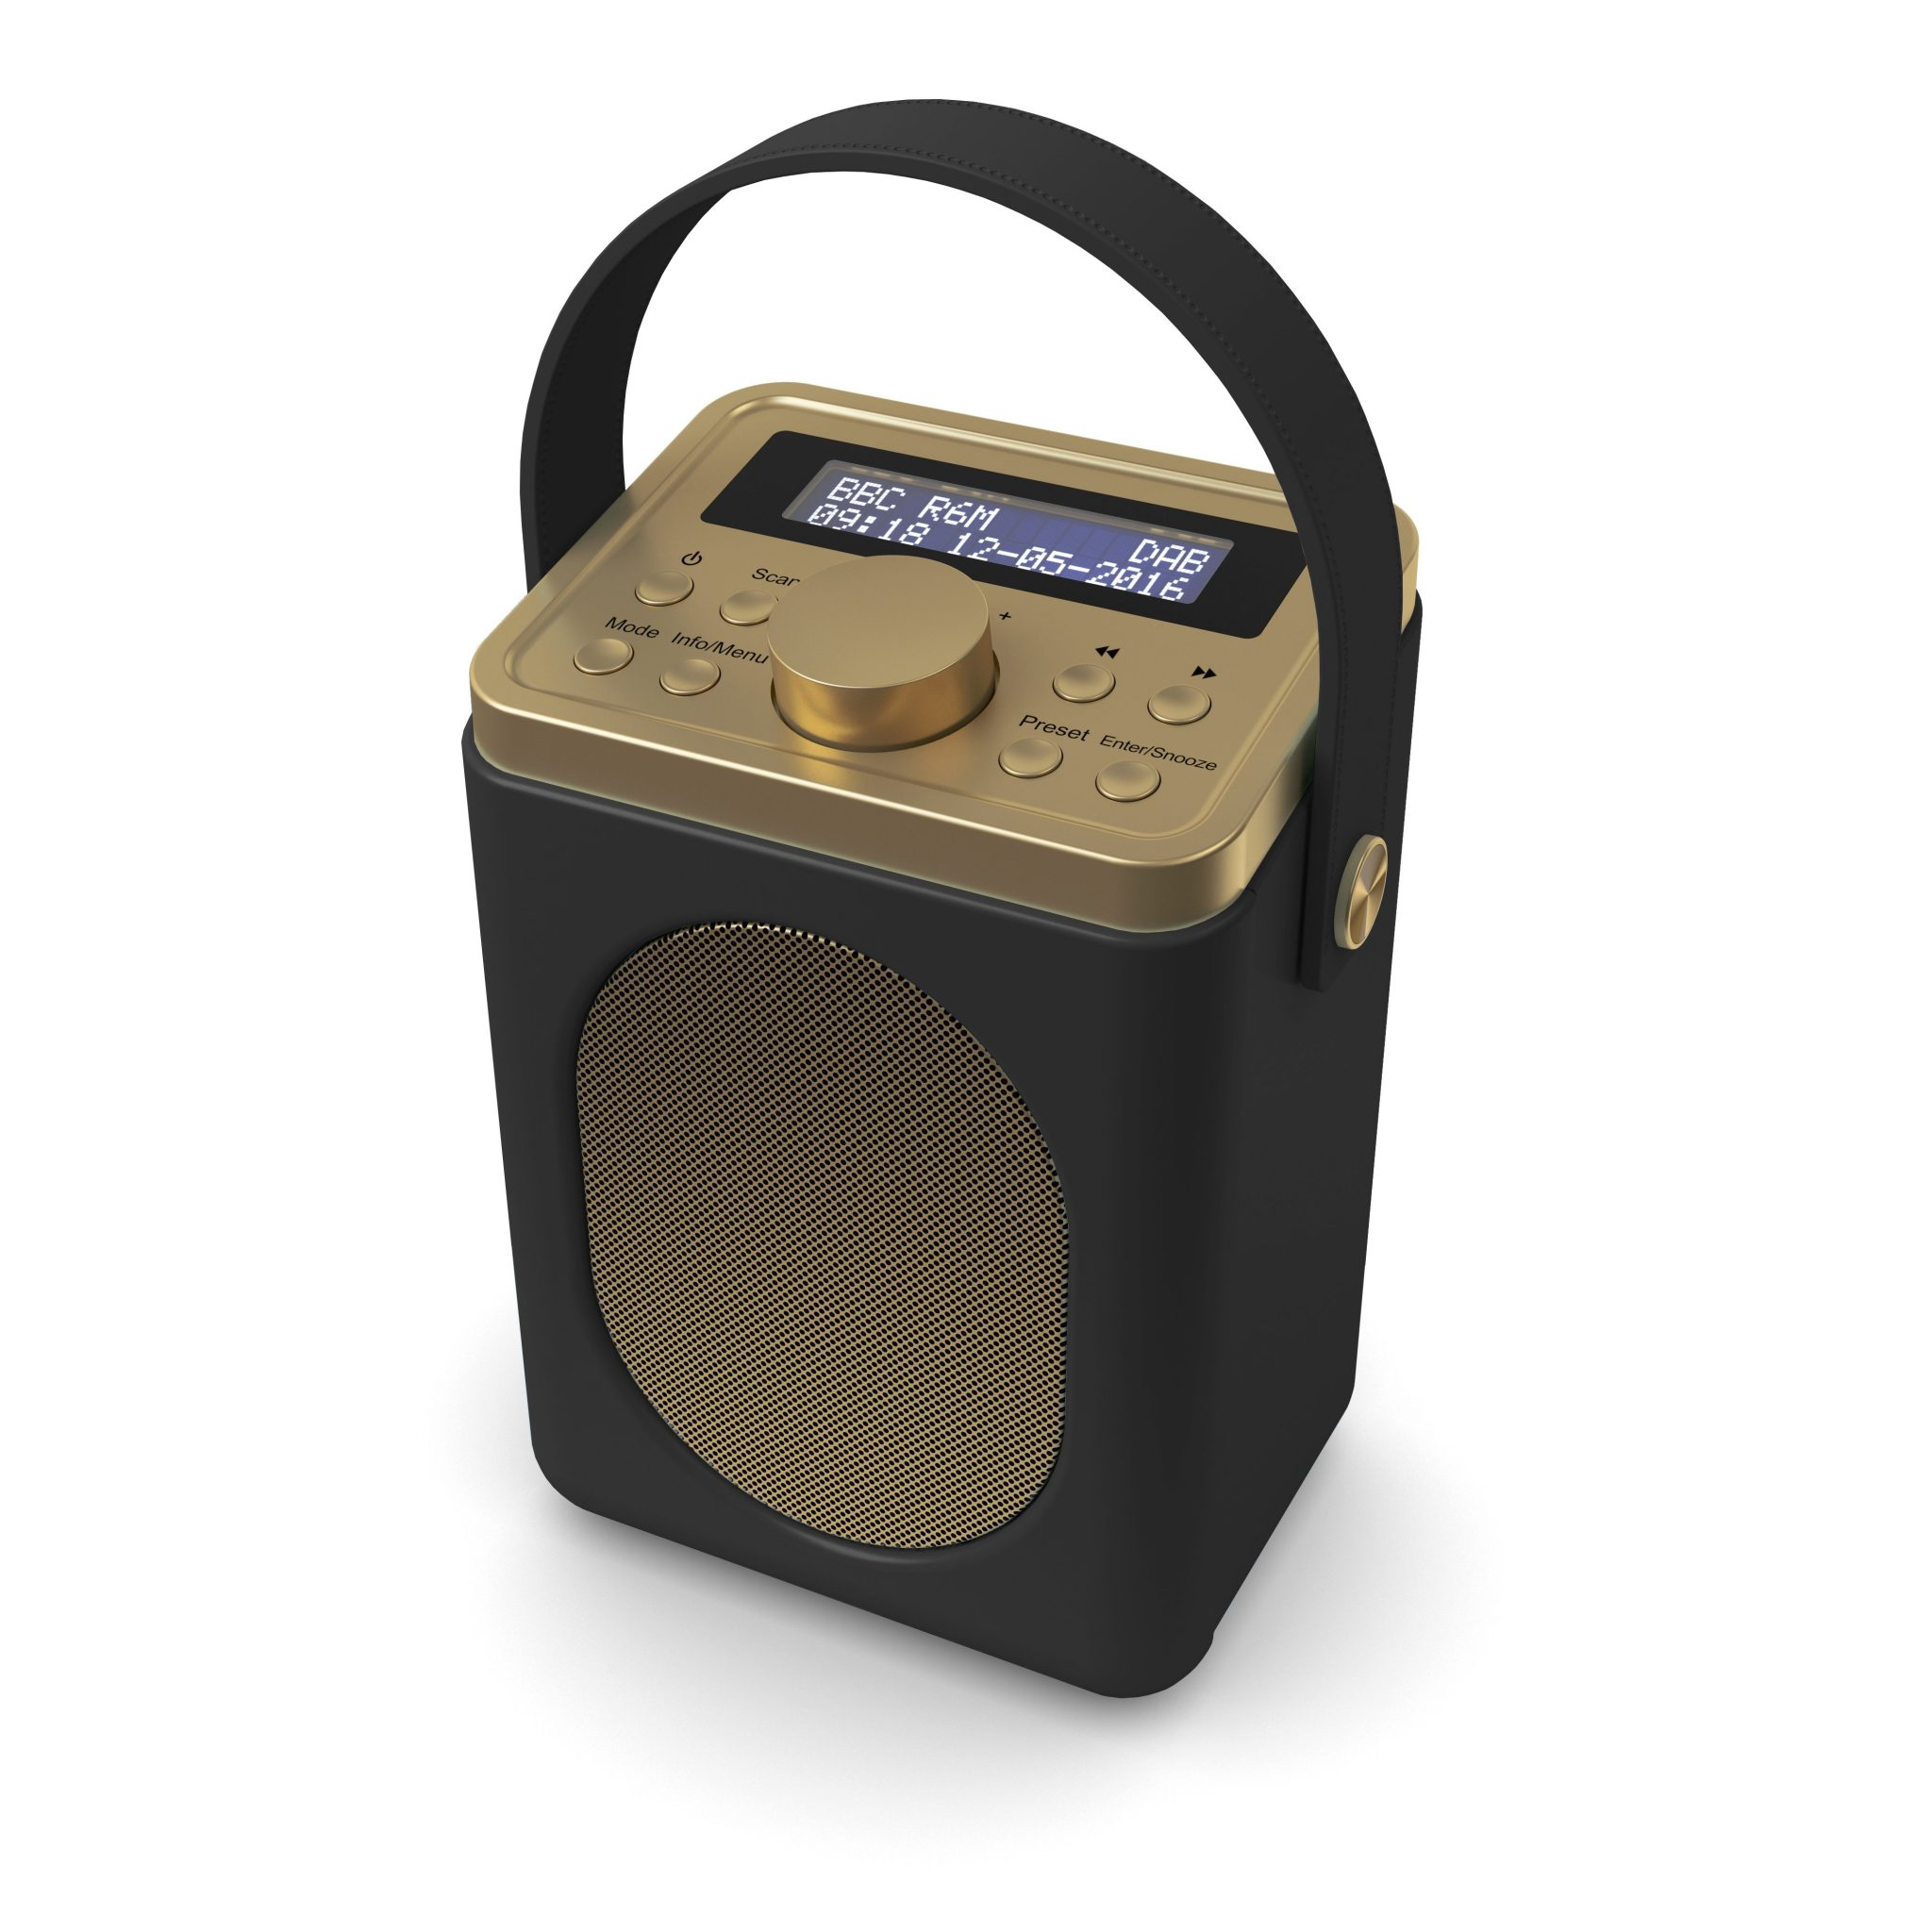 DAB Radio with Bluetooth - Little Shelford Black Angled